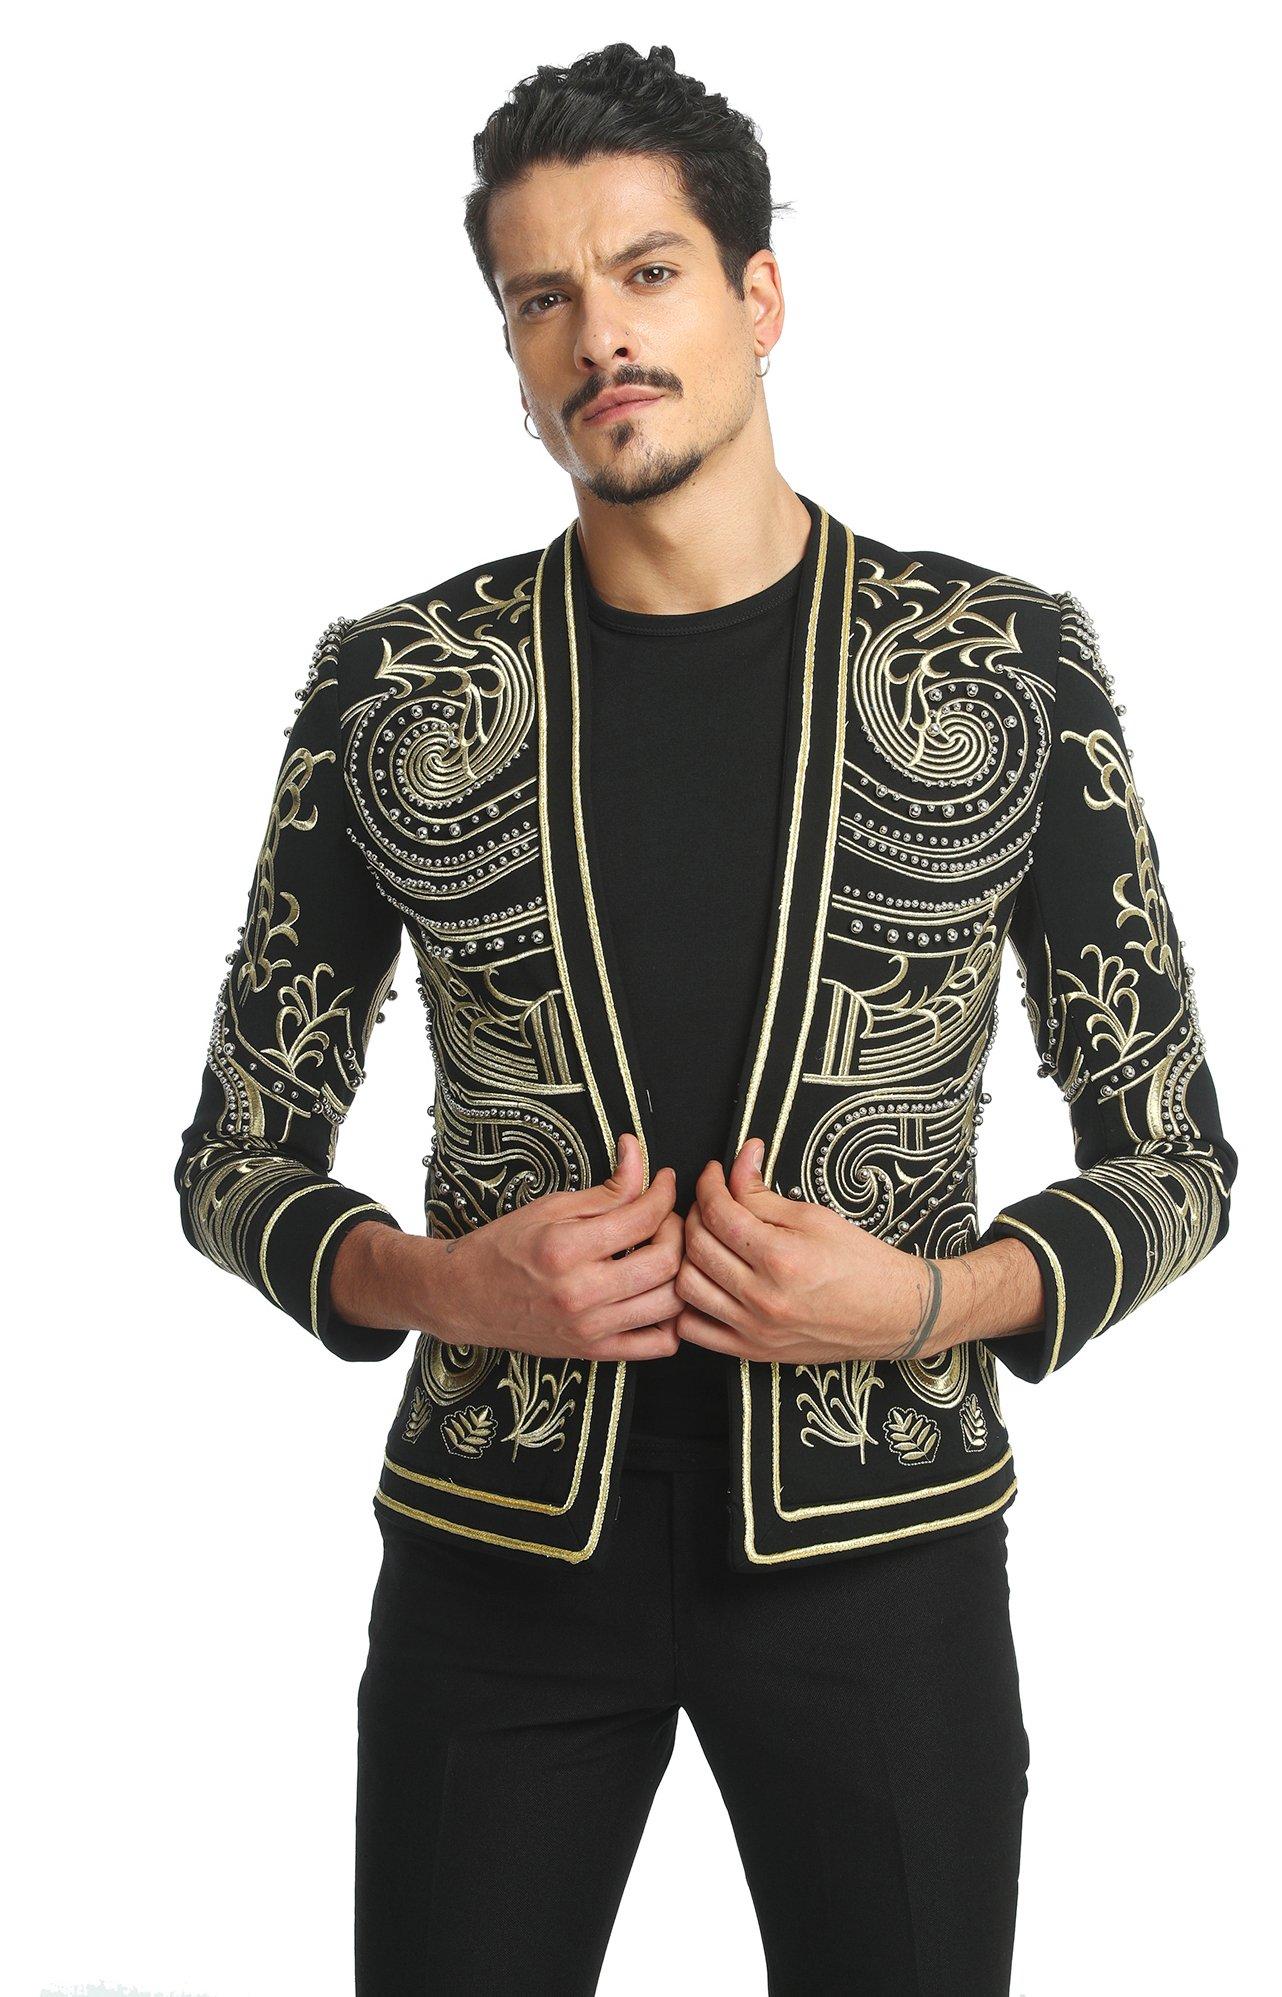 Pizoff Men's Luxury V-Neck Slim Fit Stylish Suit Blazer Jacket Long Sleeve Formal Dinner Dress AD001-02-L by Pizoff (Image #1)